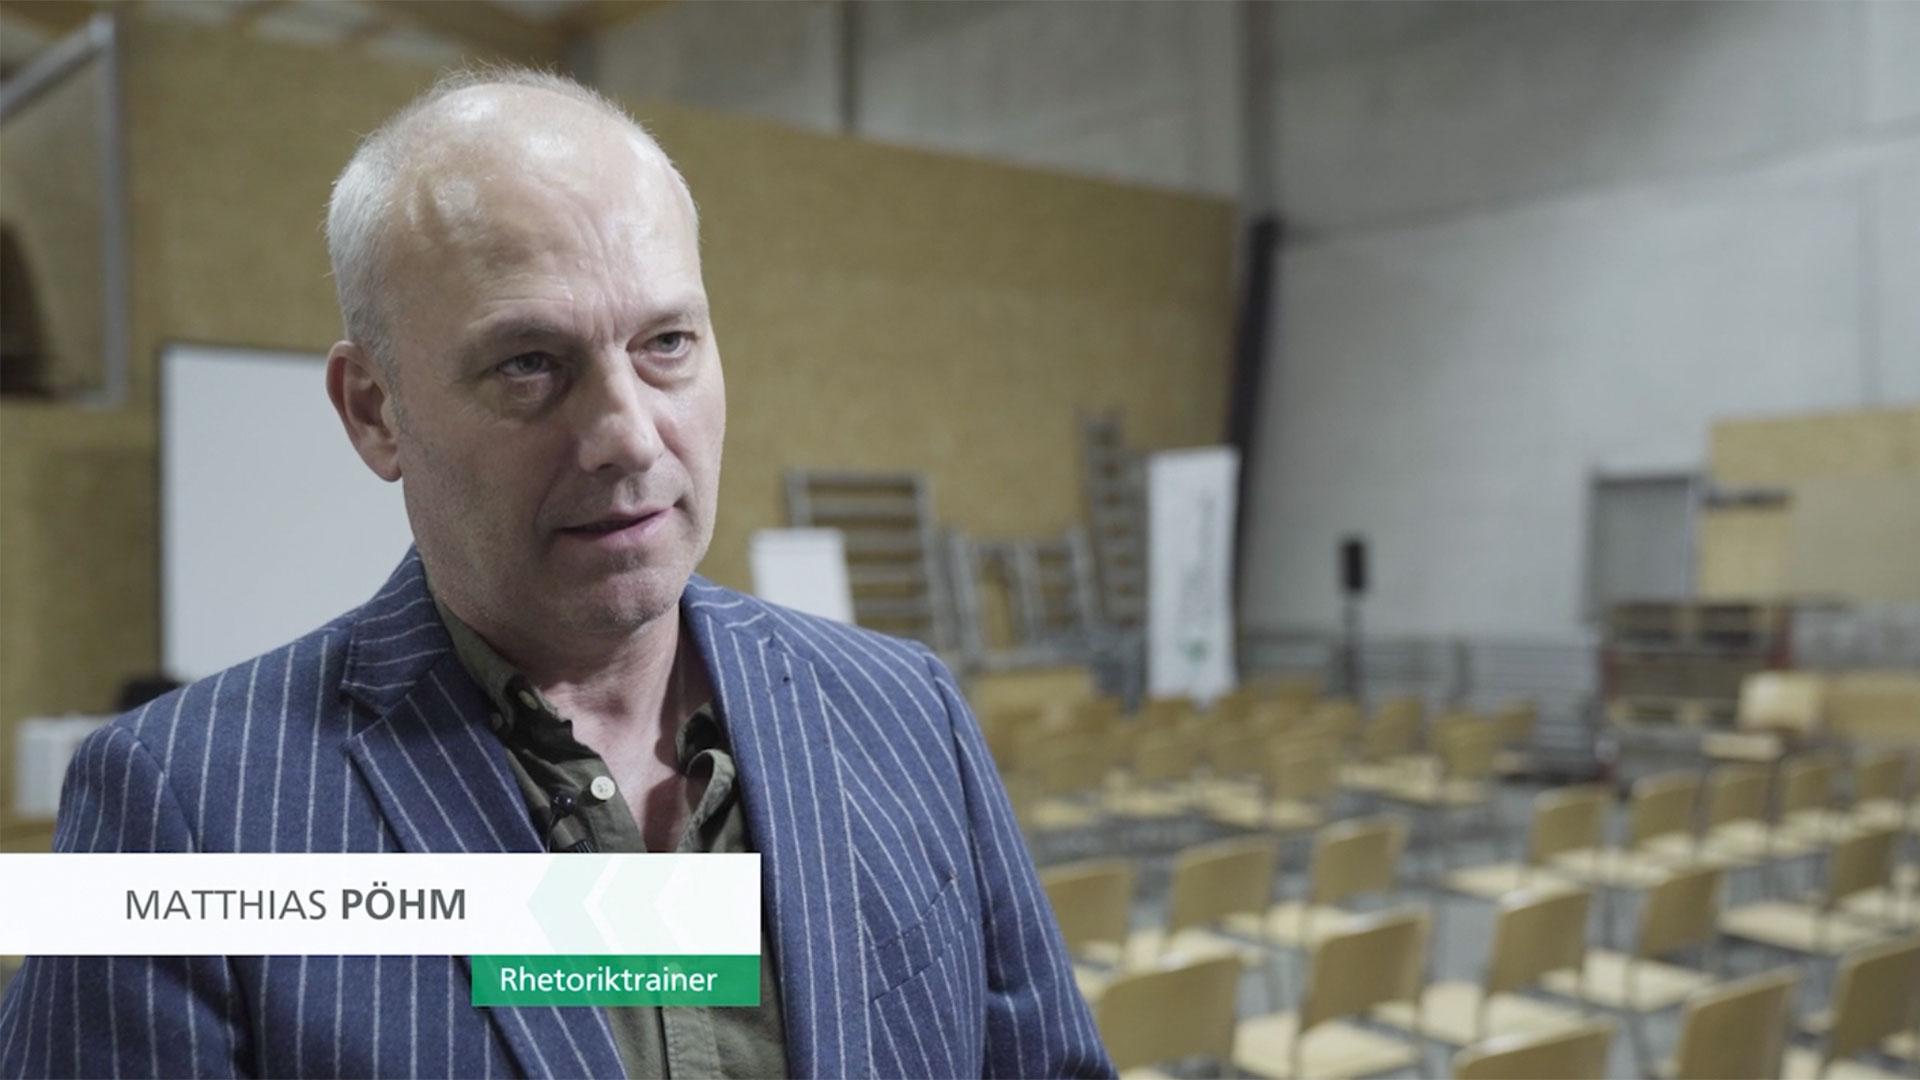 KMU-Fokus: Matthias Pöhm